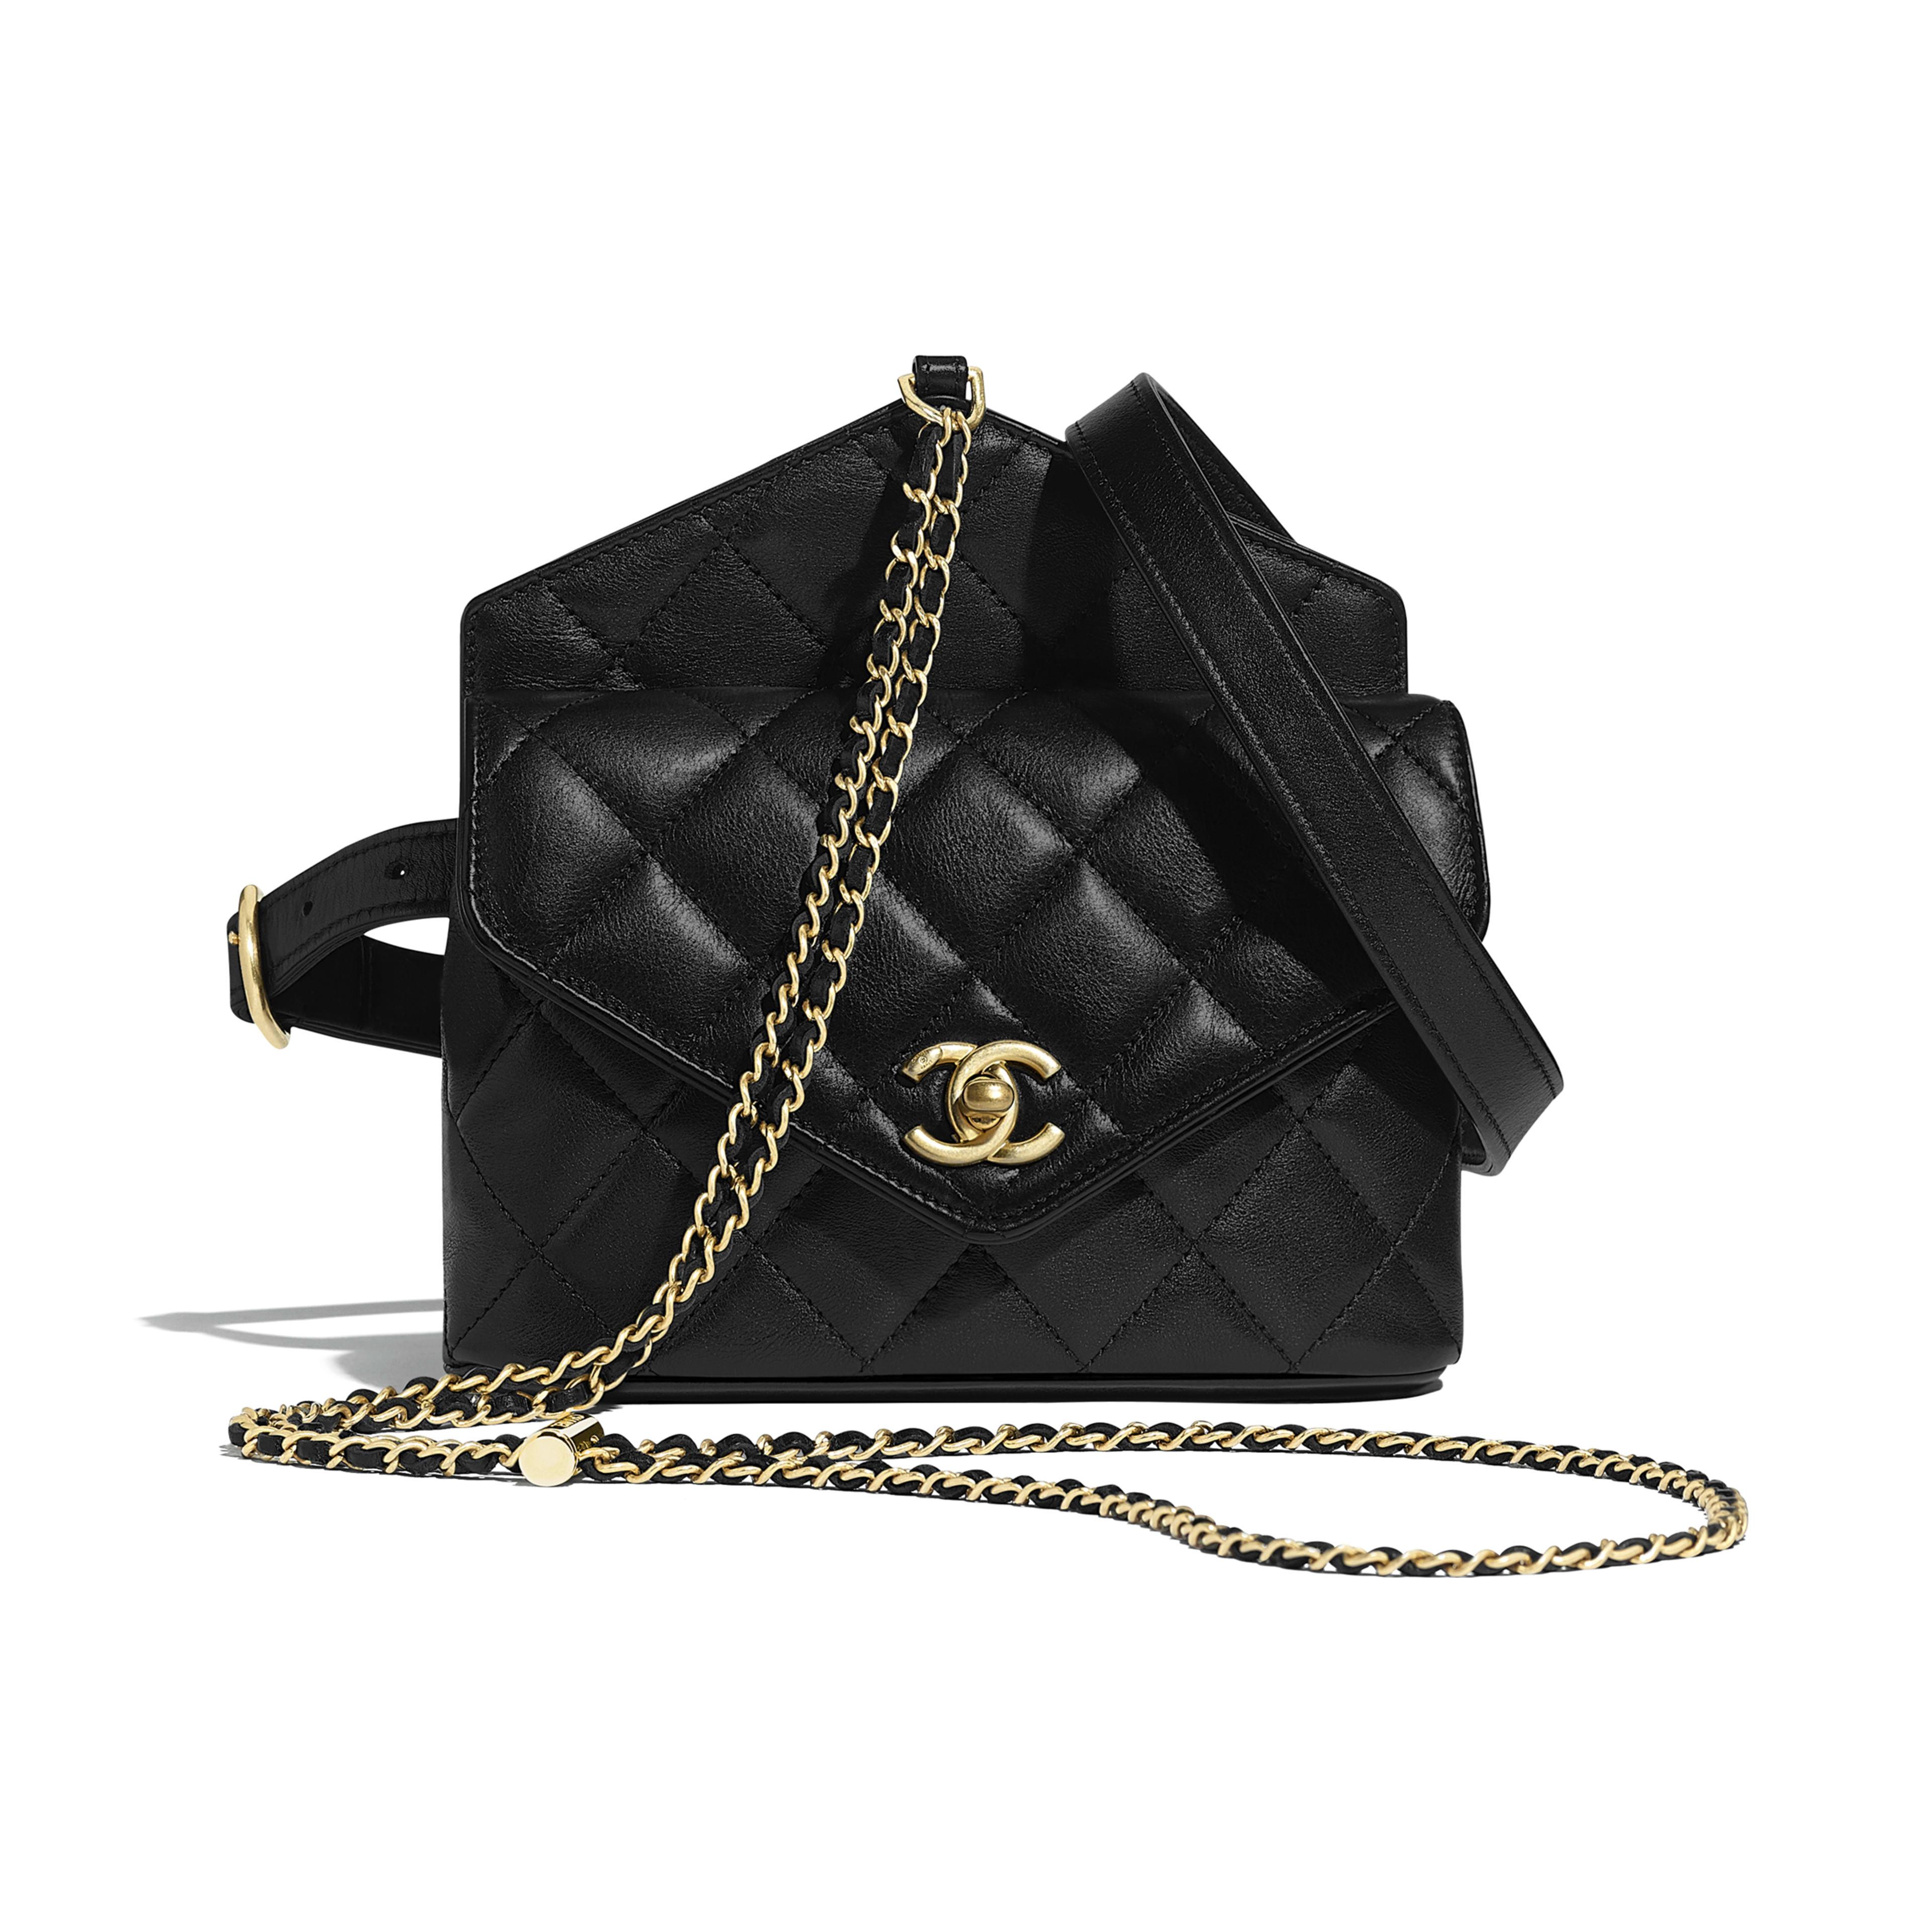 Waist Bag - Black - Calfskin & Gold-Tone Metal - Default view - see full sized version